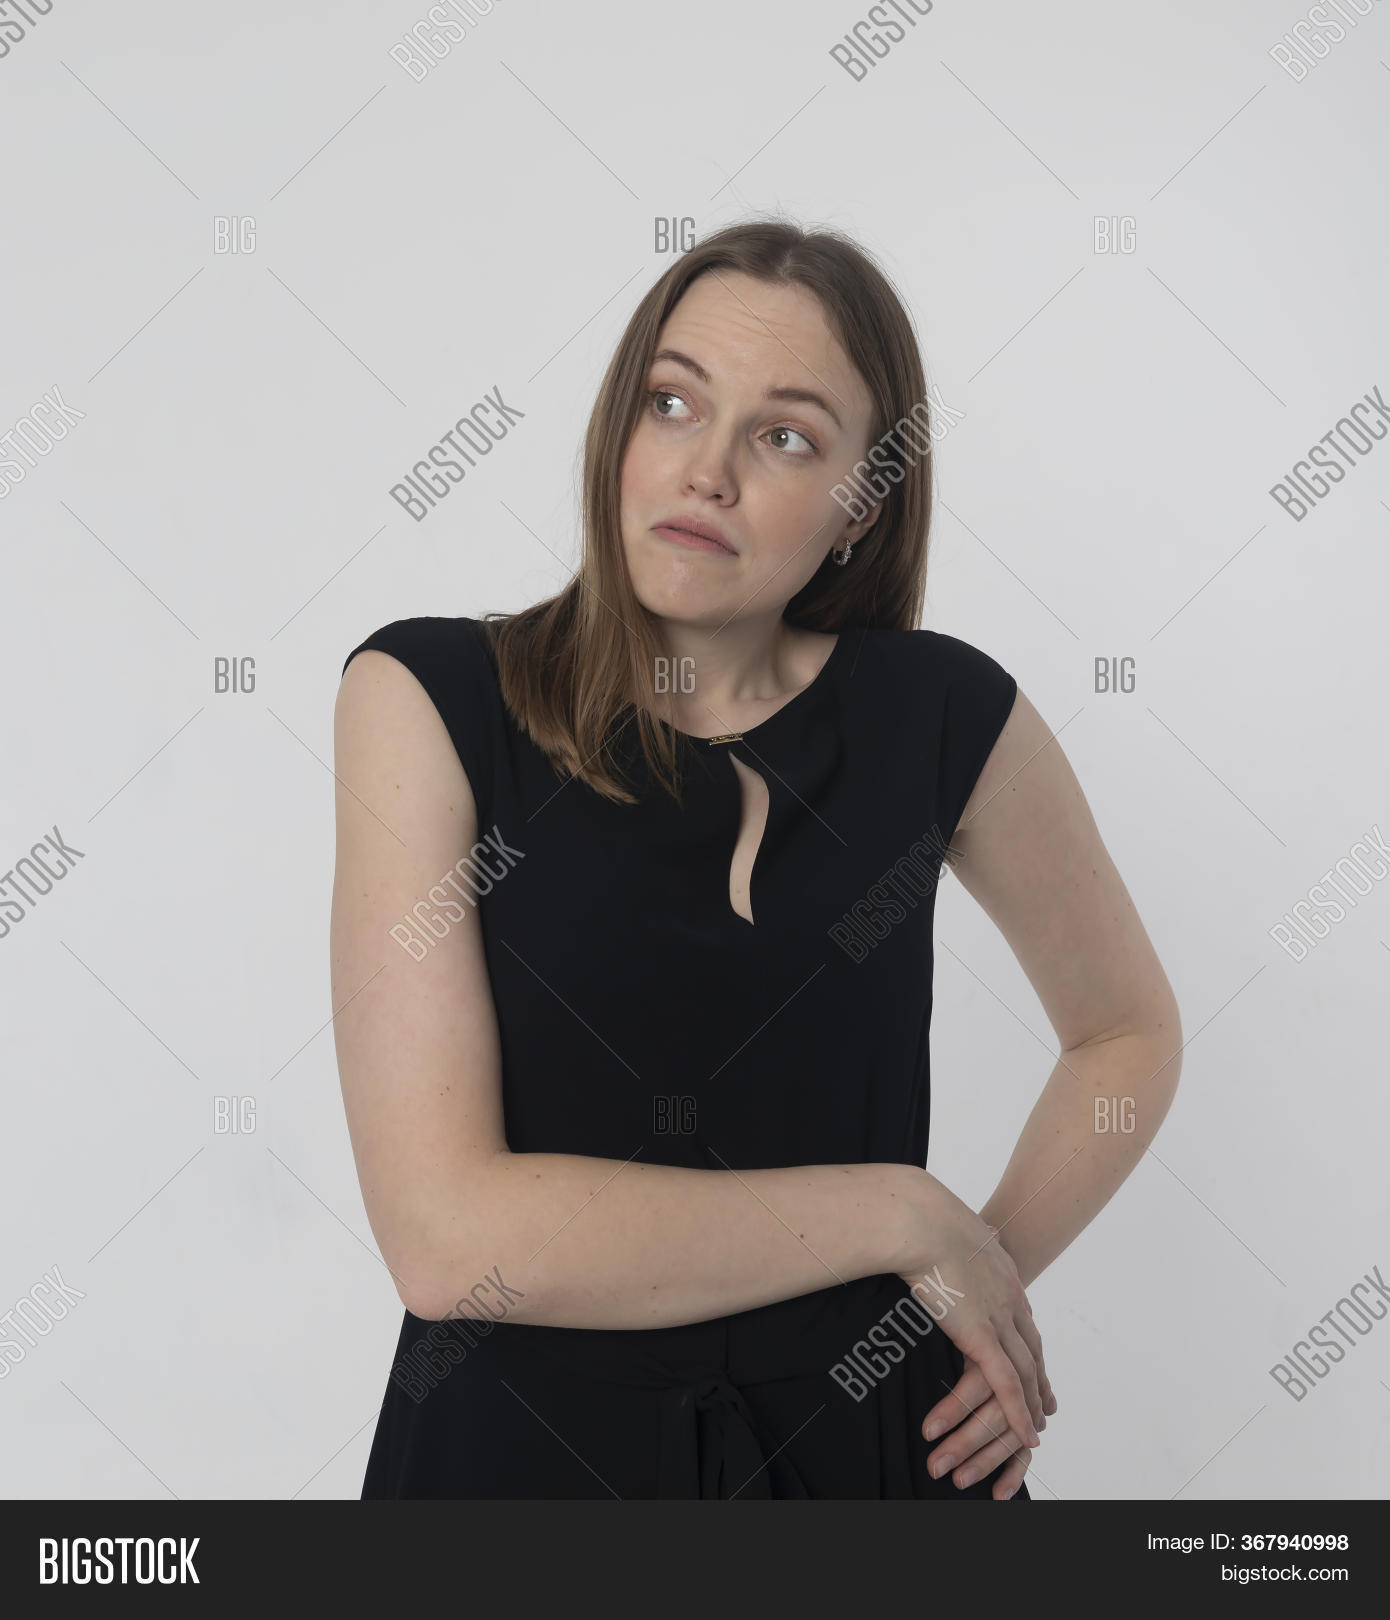 Shy Embarrassed Image & Photo (Free Trial)   Bigstock